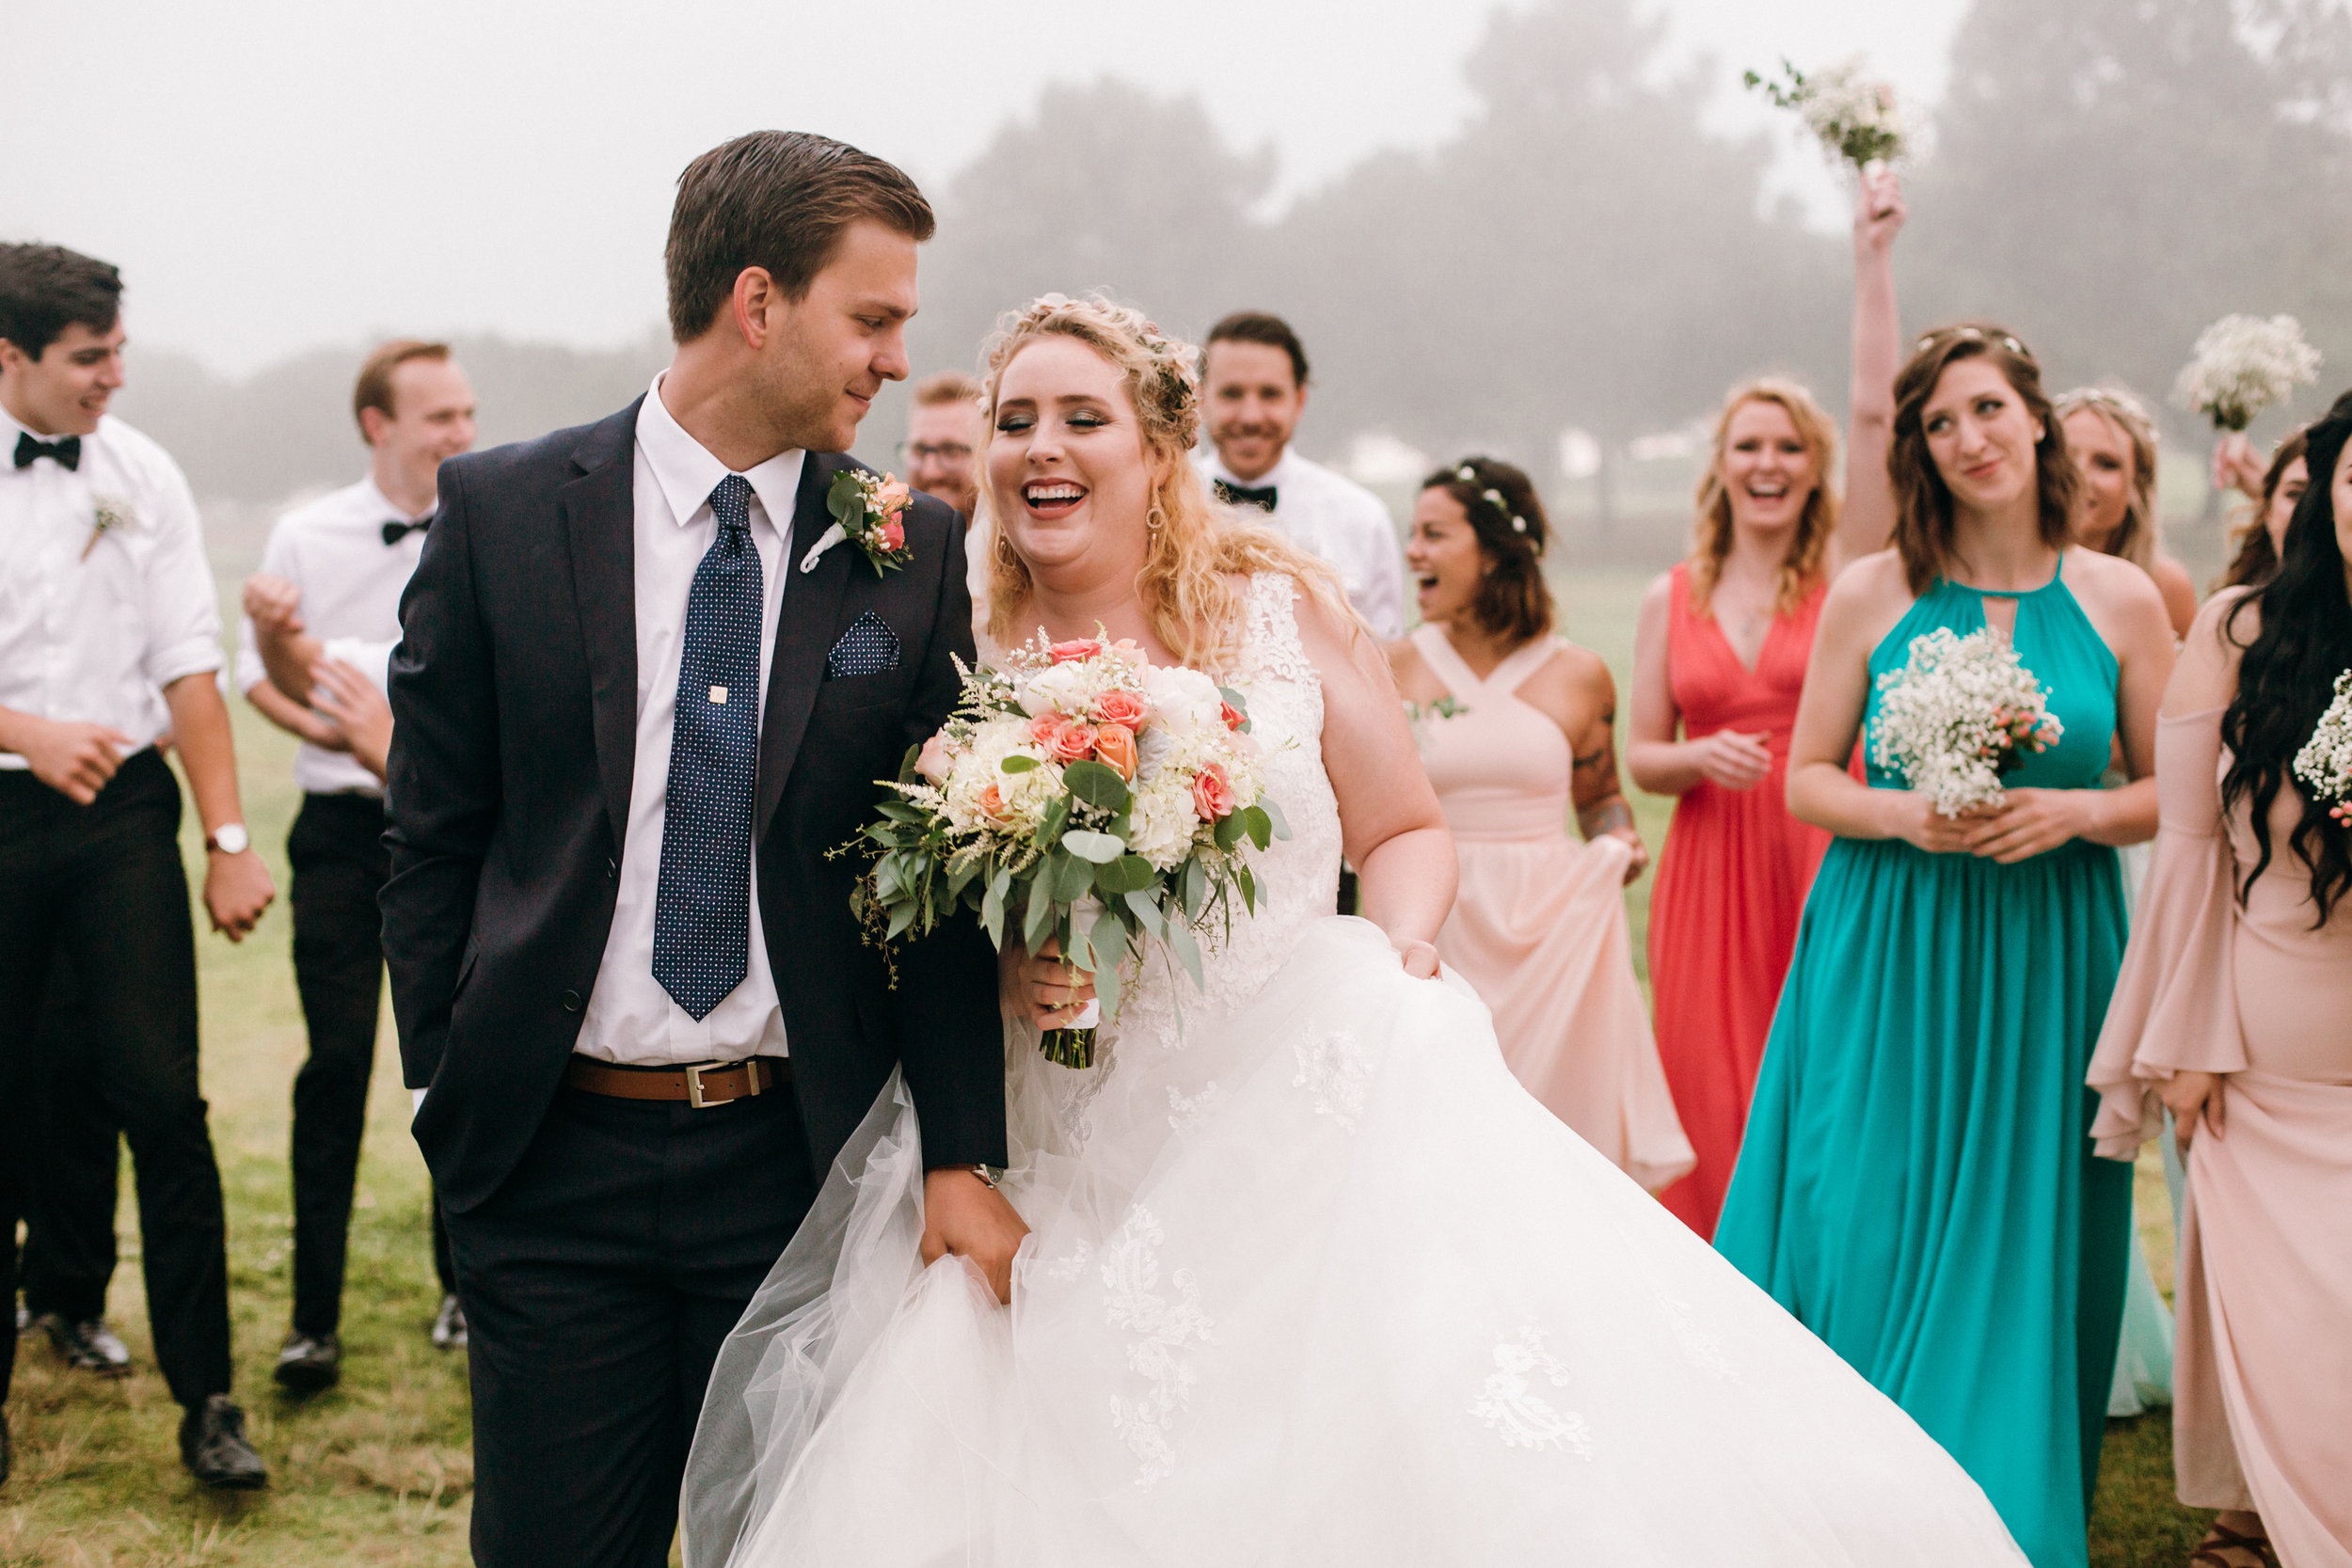 KaraNixonWeddings-PalosVerdes-Wedding-44.jpg